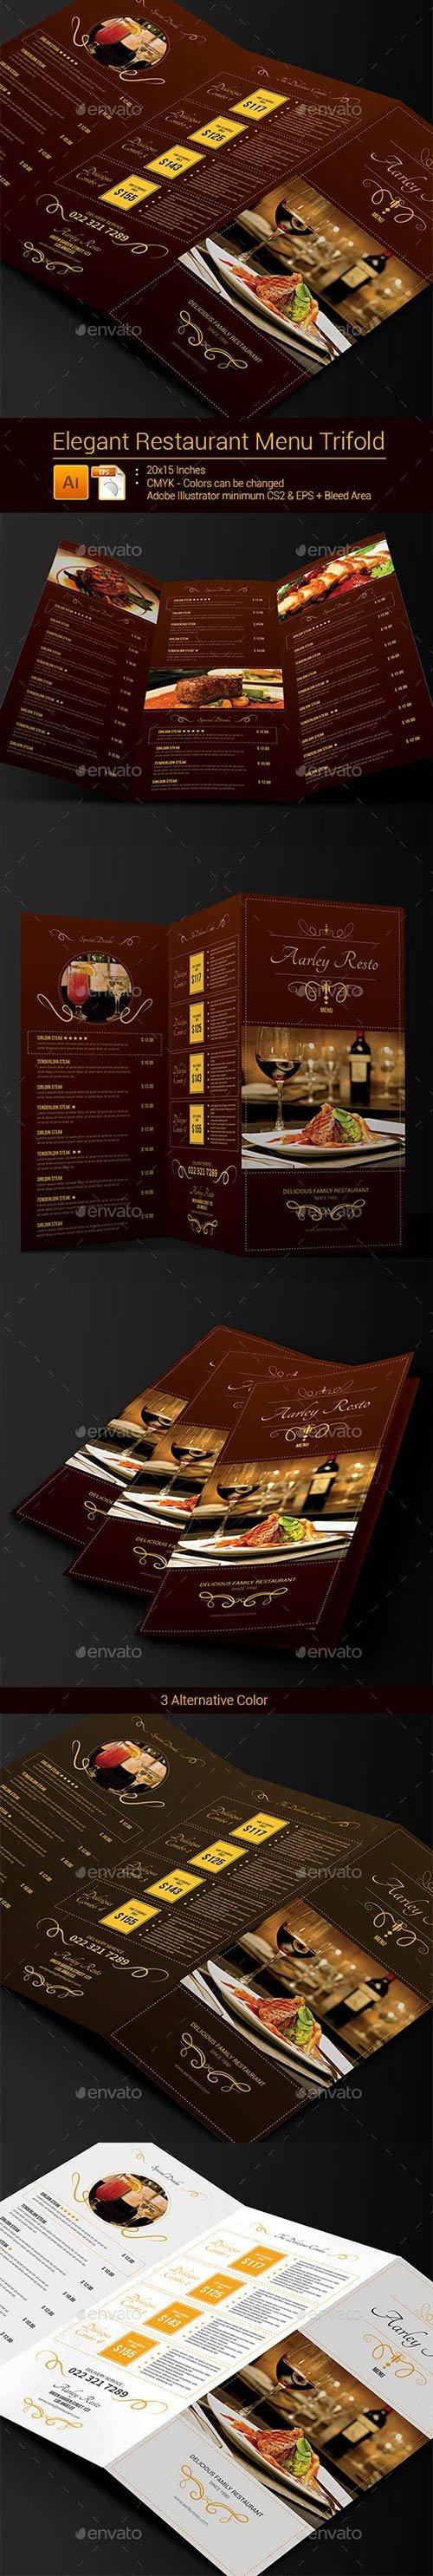 Graphicriver - Elegant Restaurant Menu Trifold 9137918